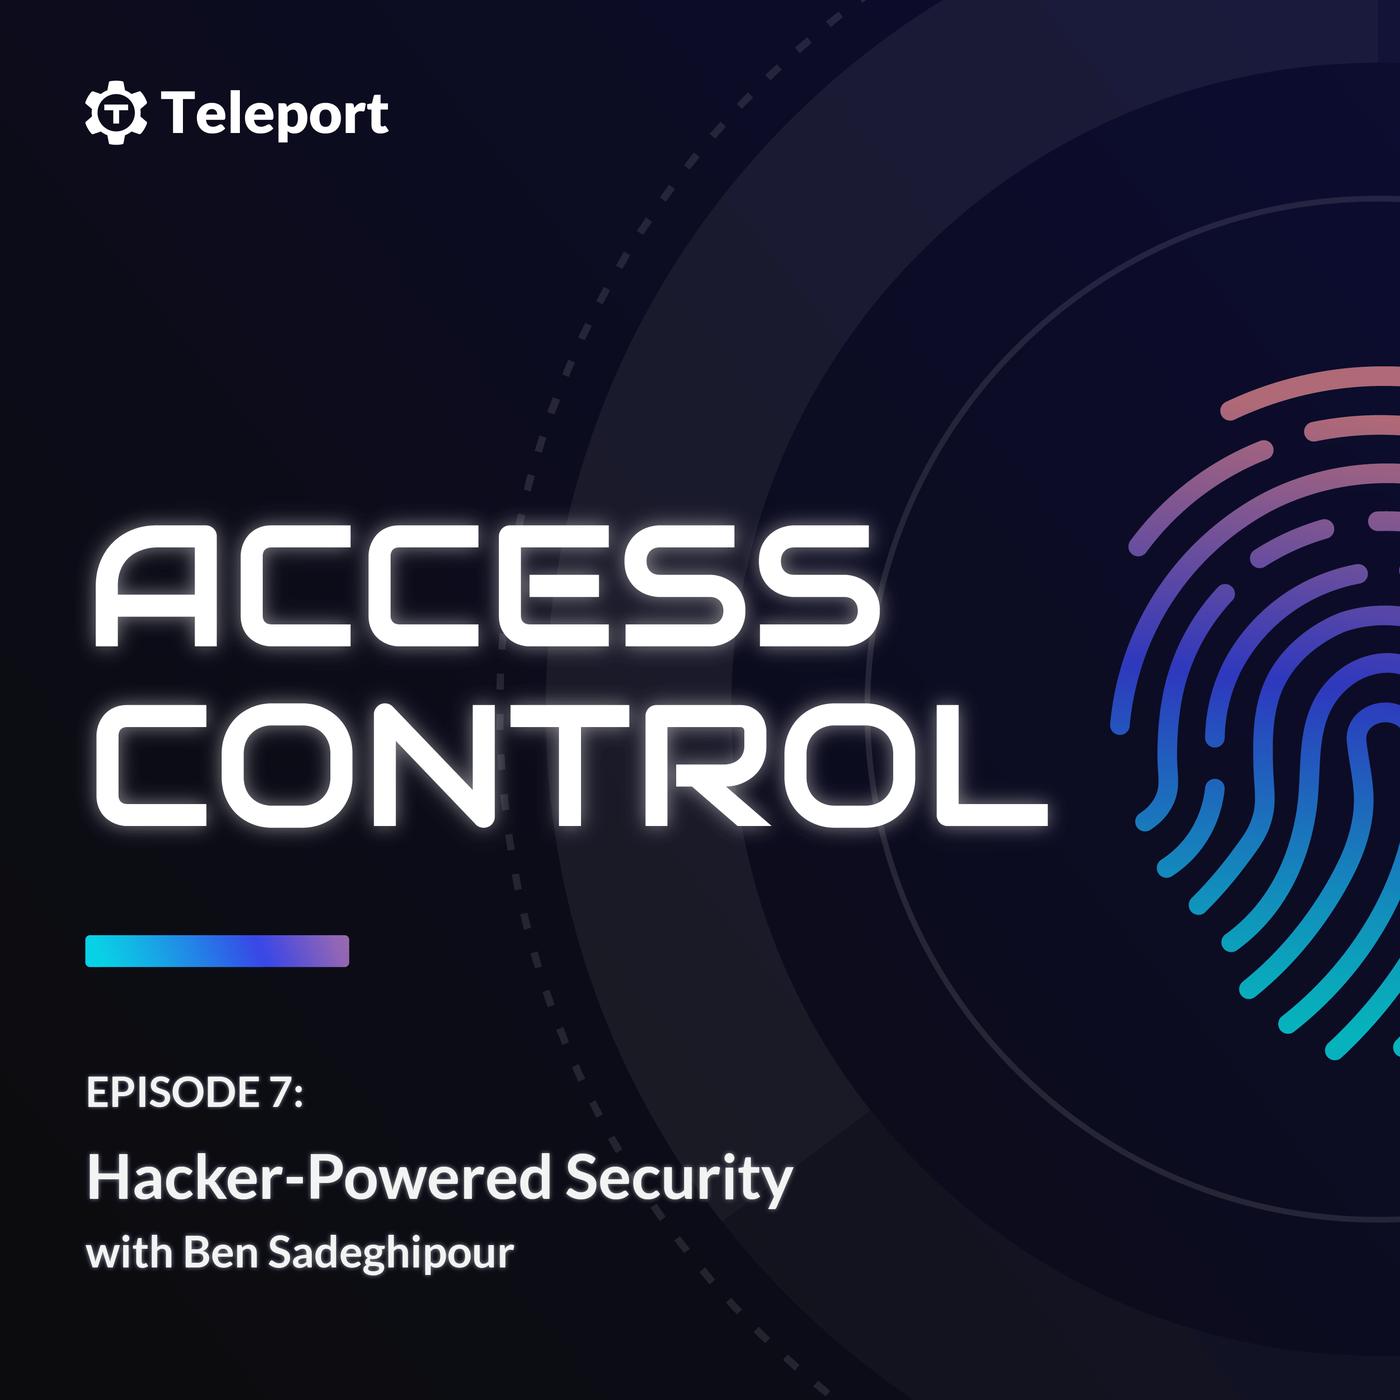 Hacker-Powered Security